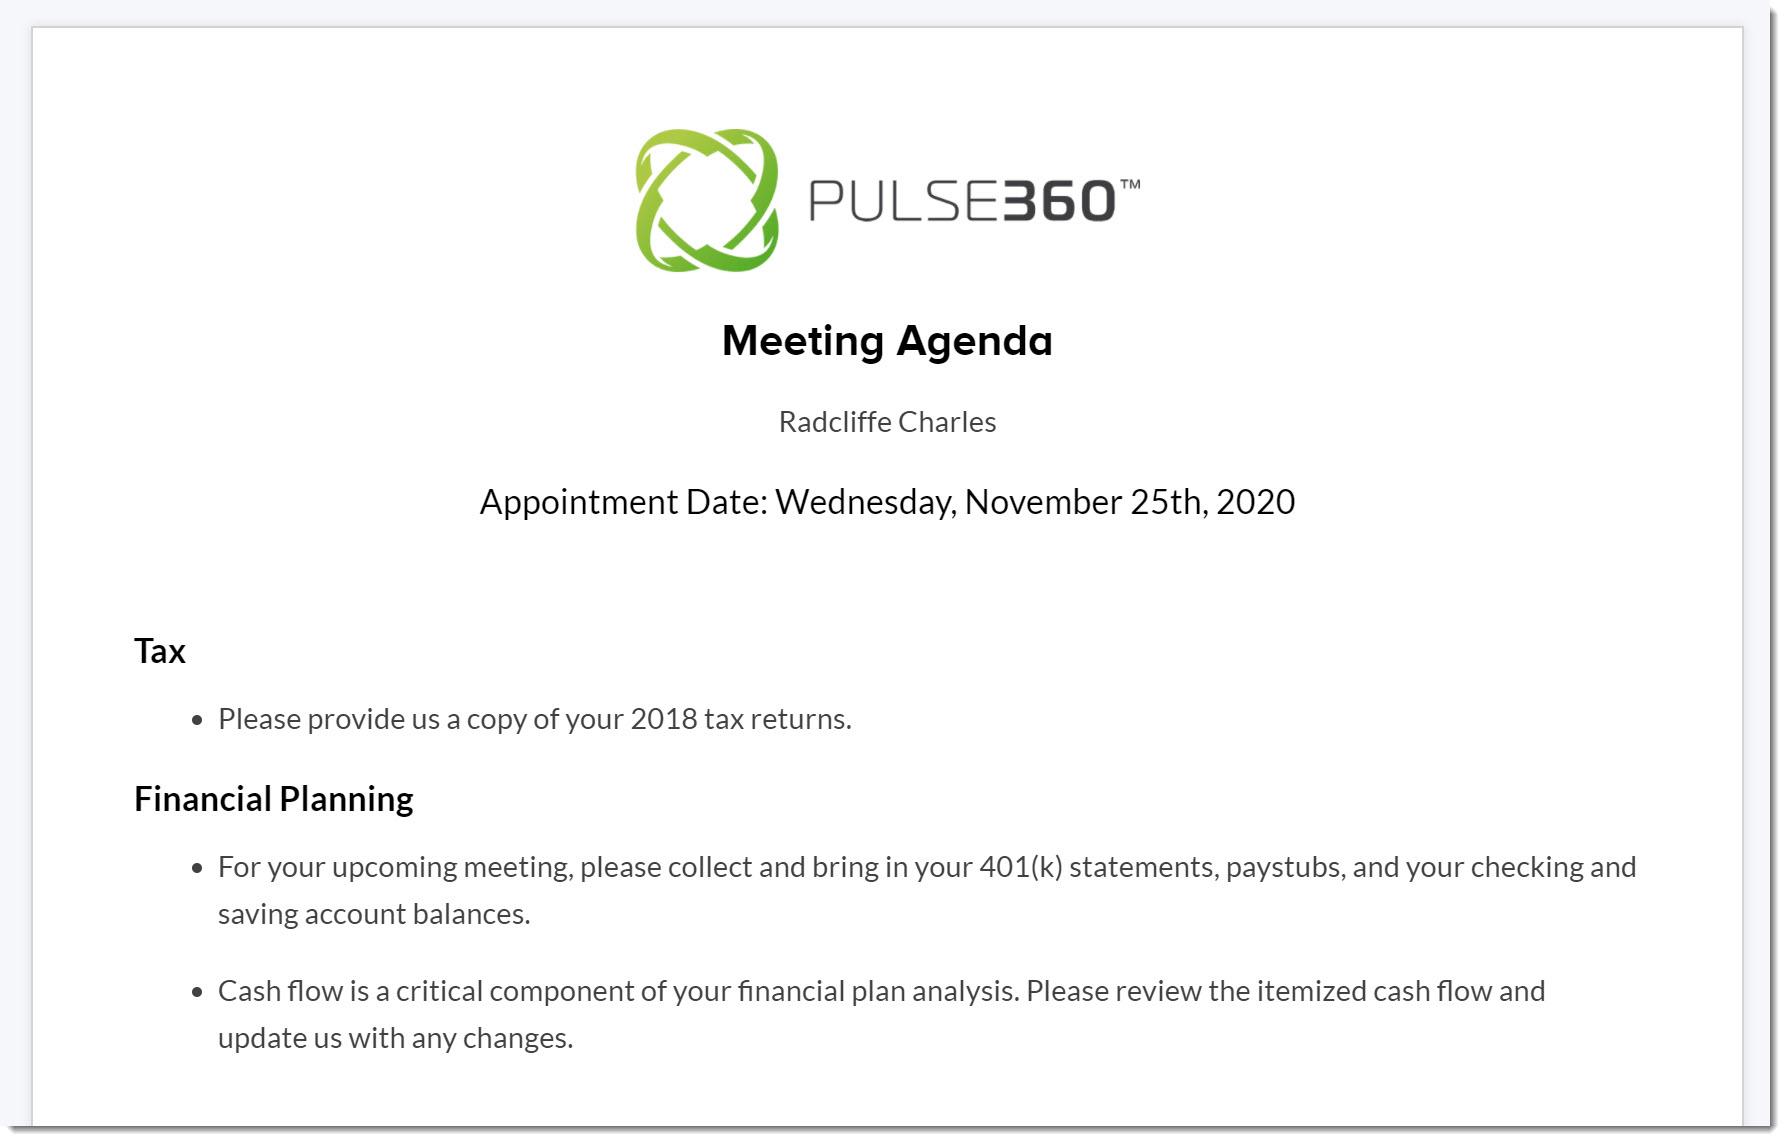 Formal Agends prepared in seconds in Pulse360